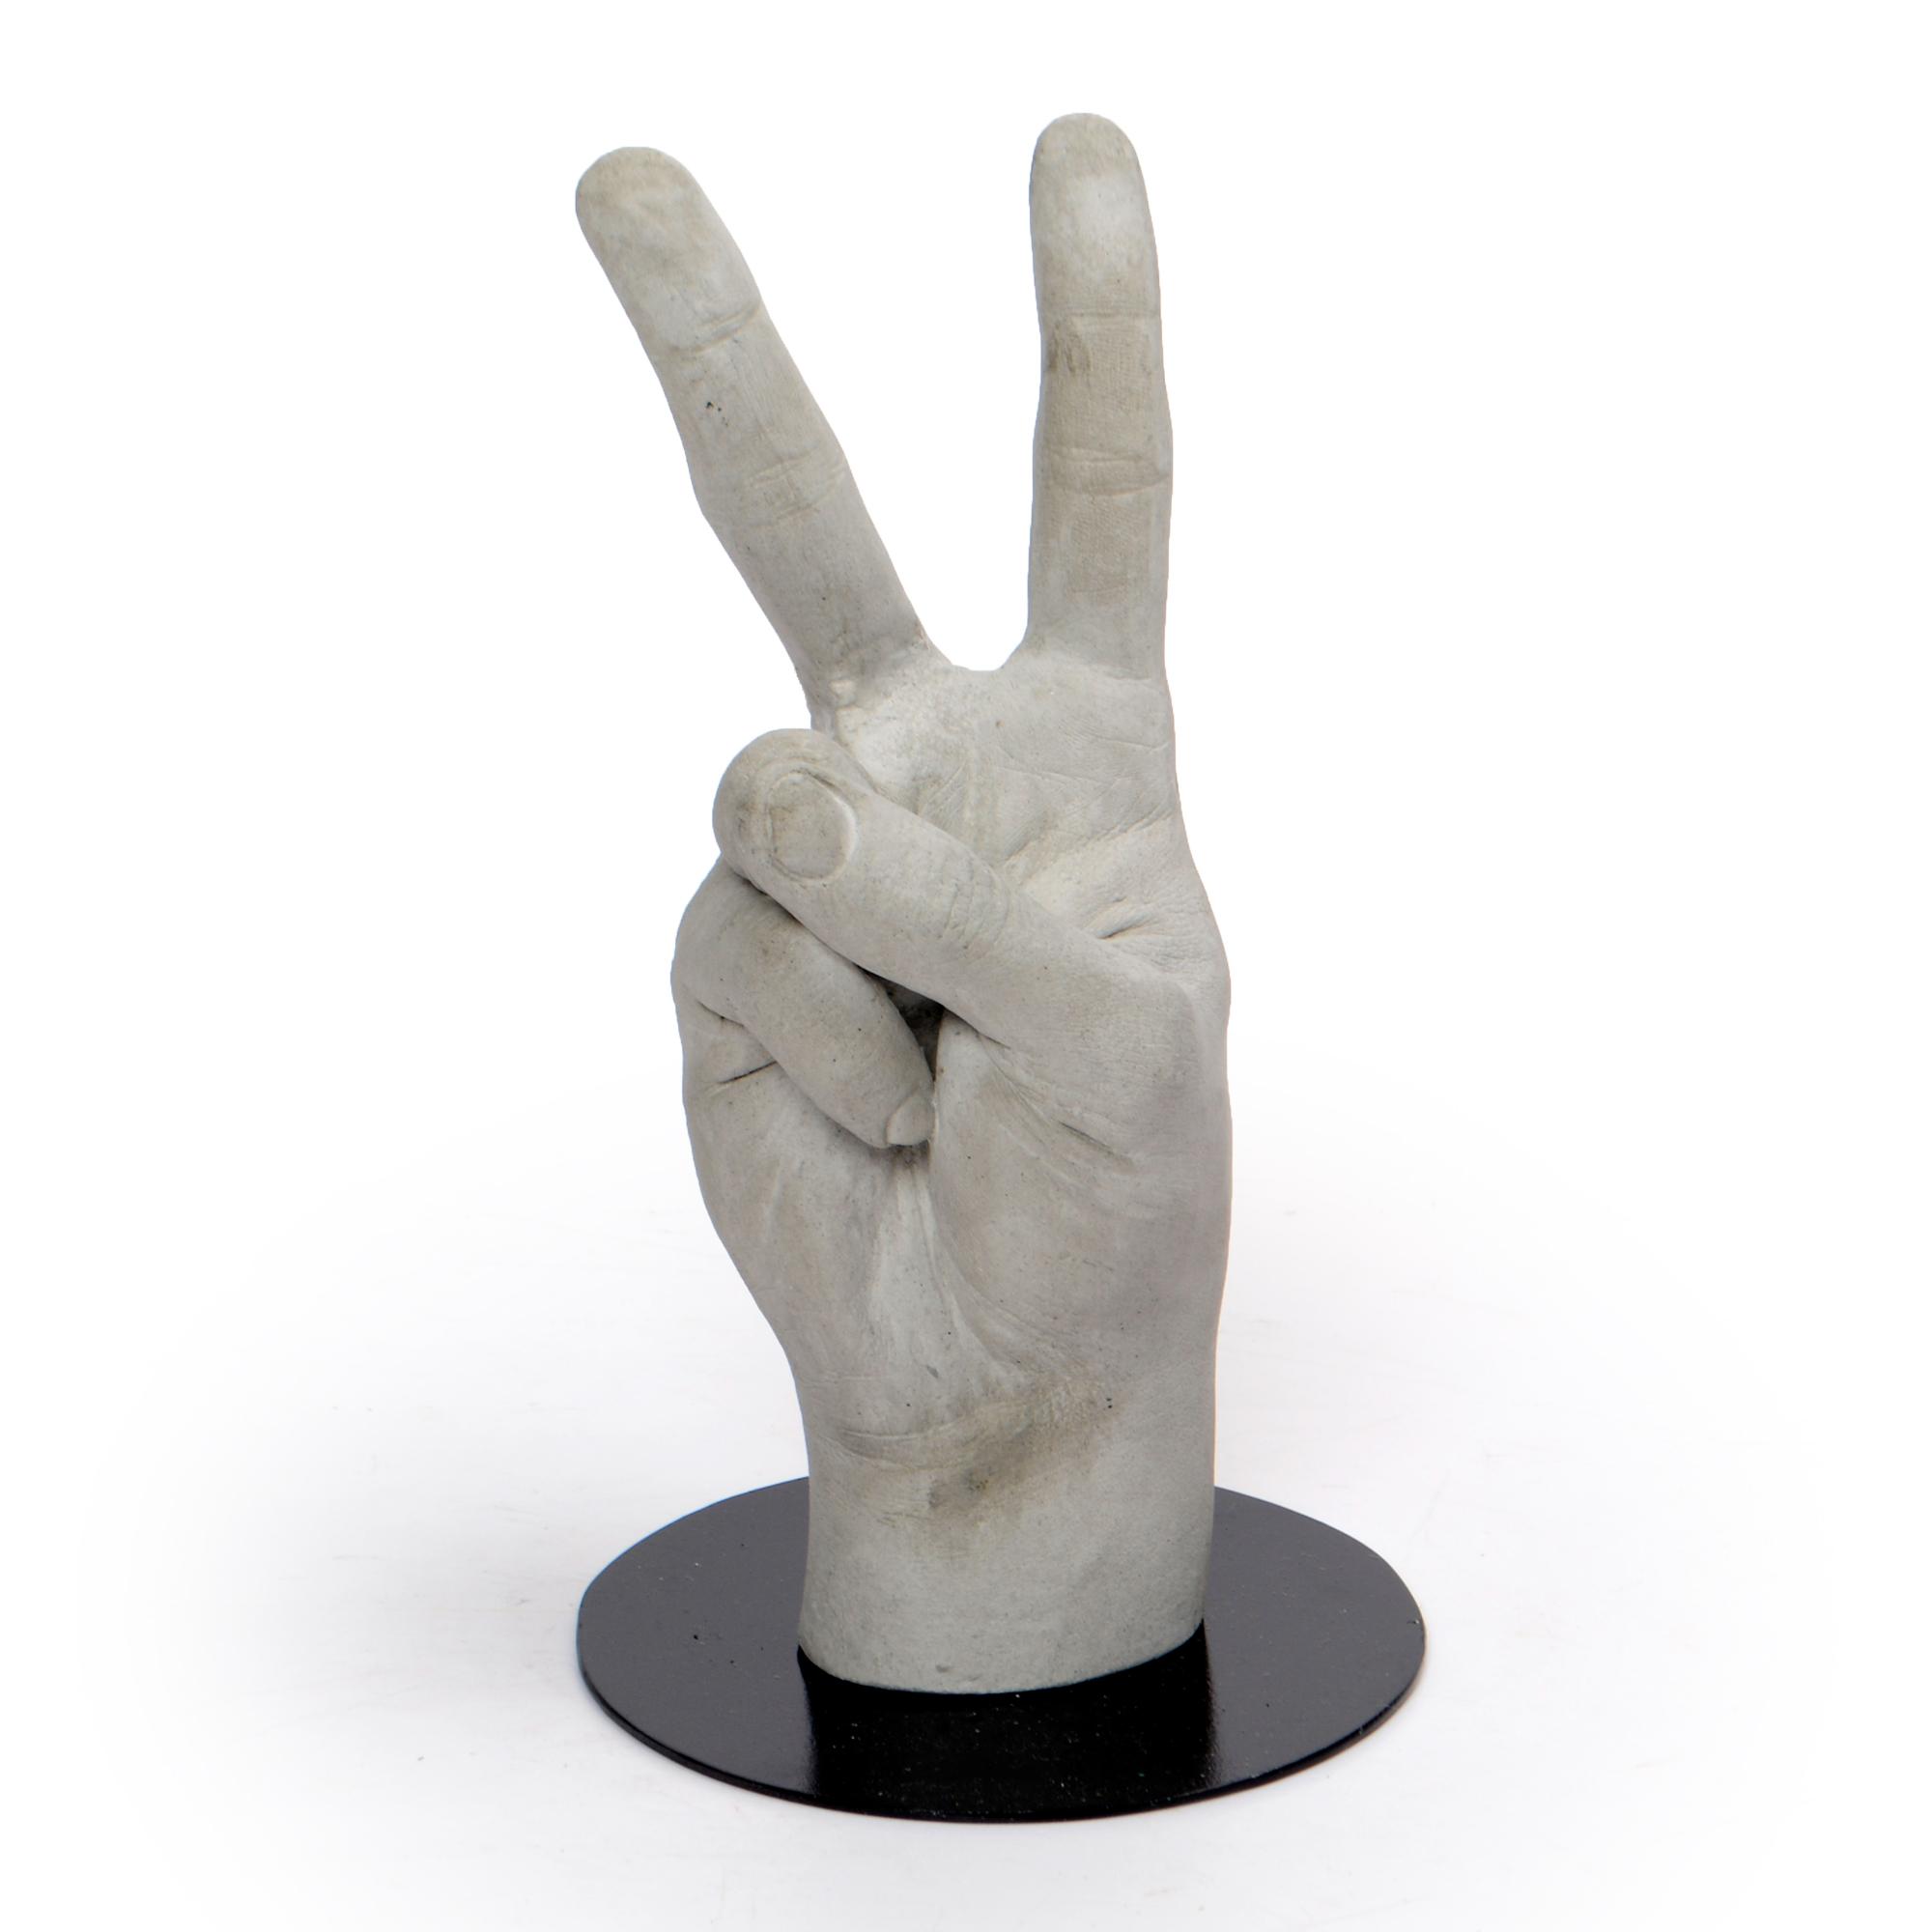 Escultura de Concreto Paz